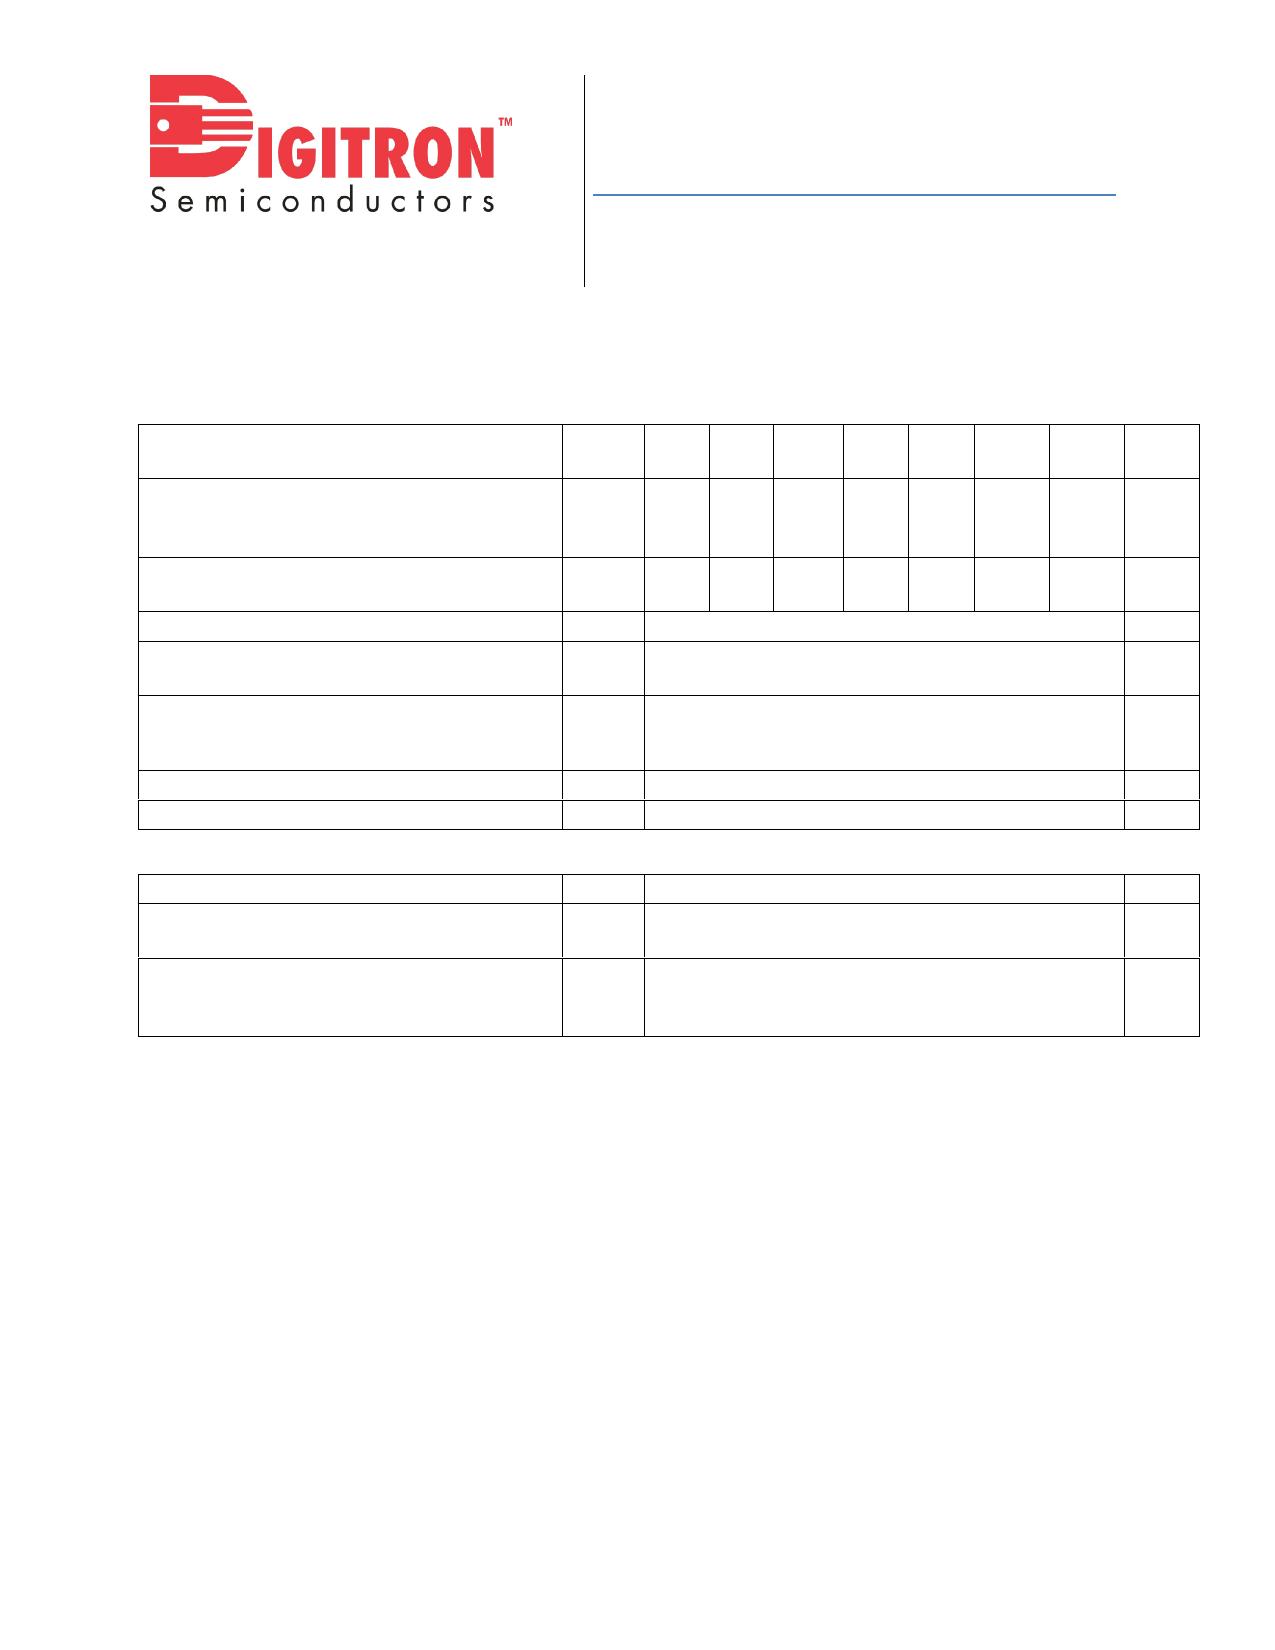 MR2006 데이터시트 및 MR2006 PDF